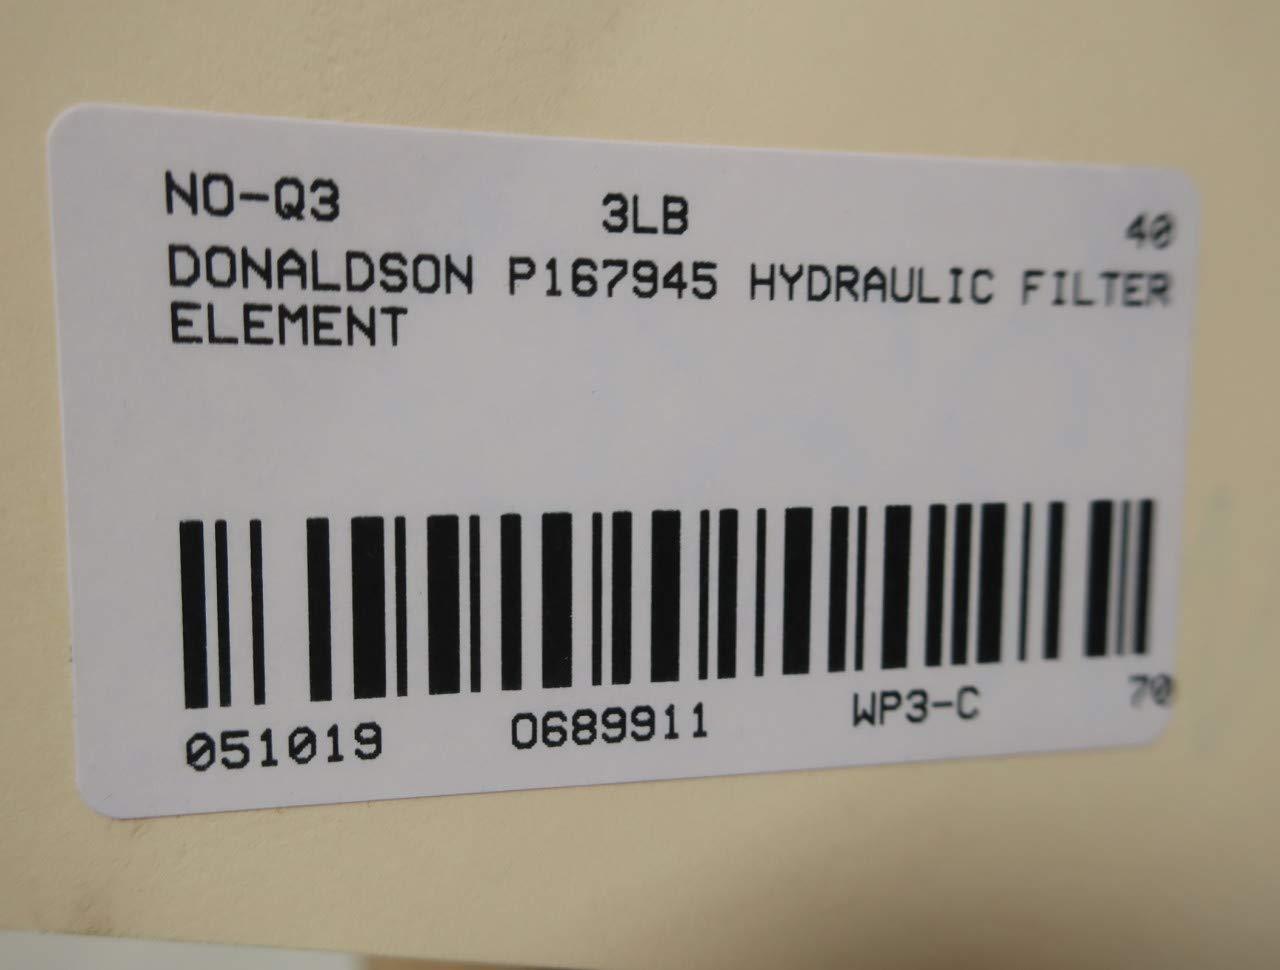 DONALDSON P167945 Hydraulic Filter Element